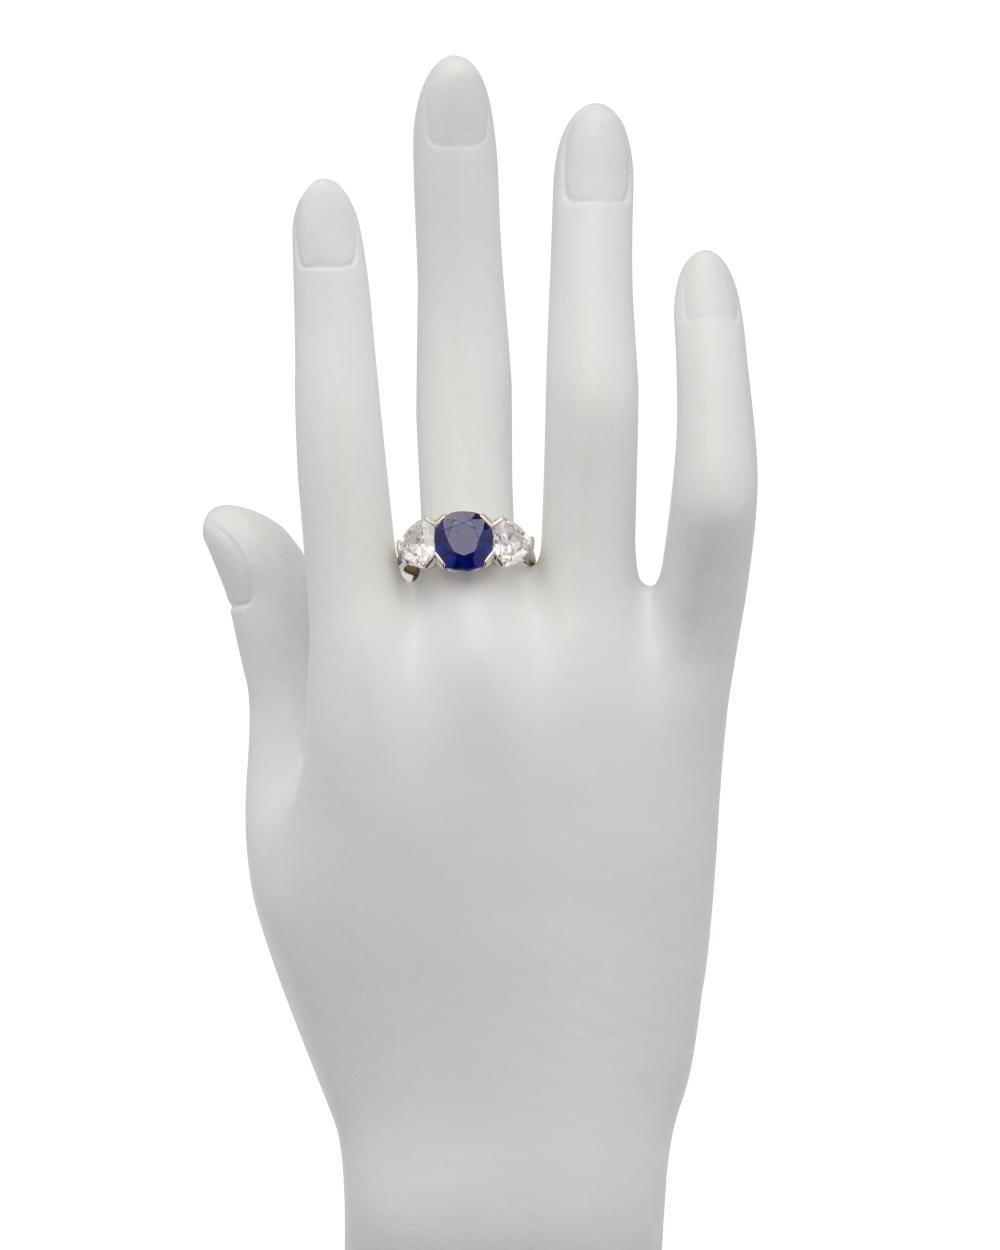 Platinum, Kashmir Sapphire, and Diamond Ring